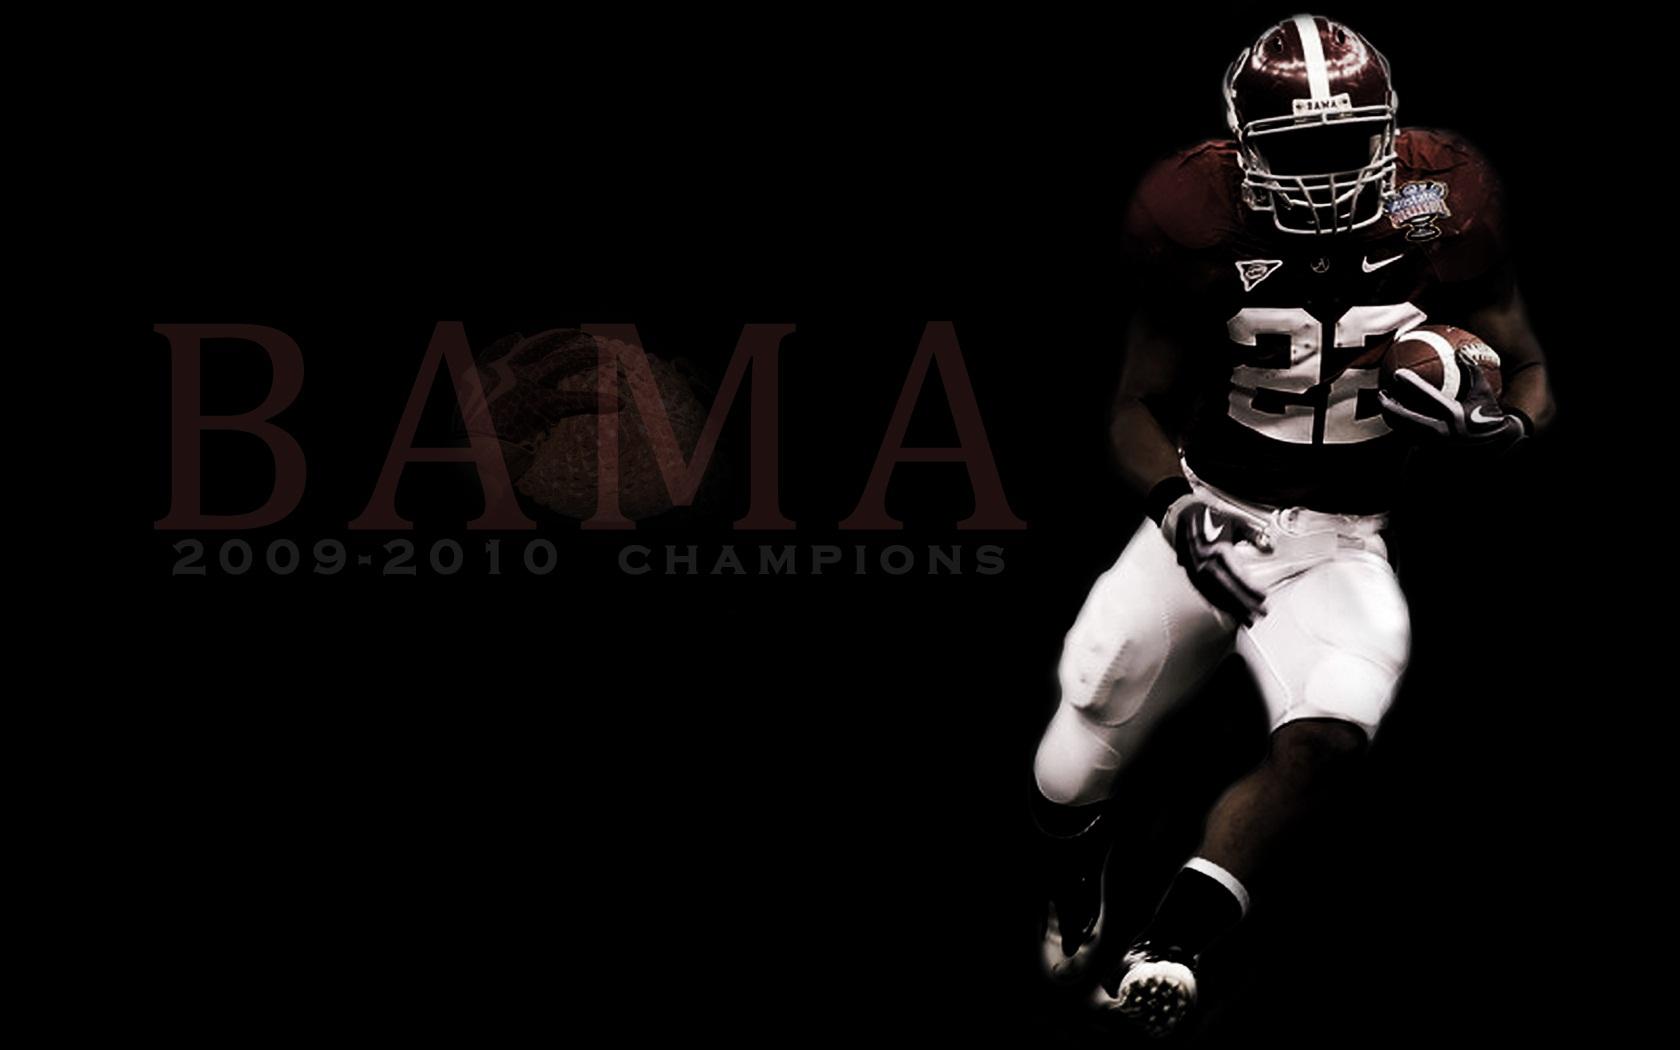 Alabama Football Wallpapers Alabama Football Wallpaper 1680x1050